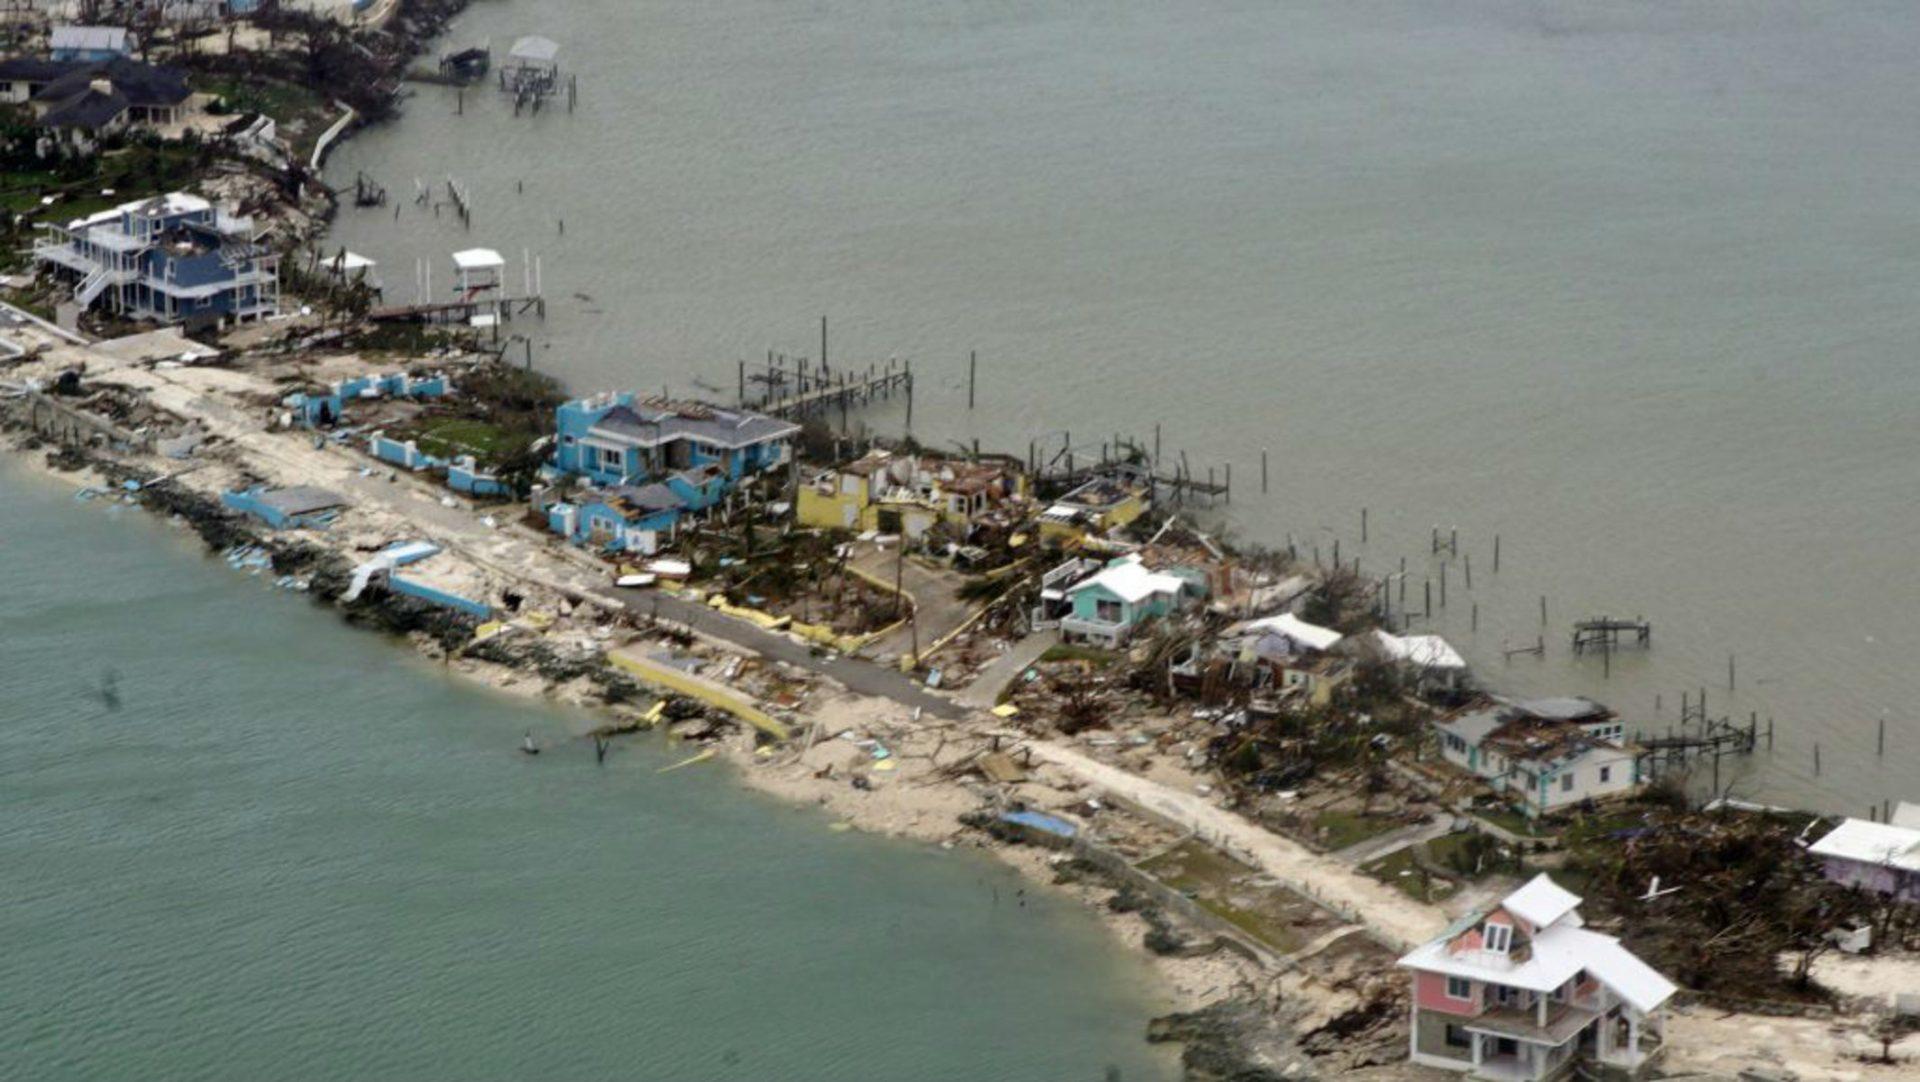 L'ouragan Dorian : une aide d'urgence s'impose